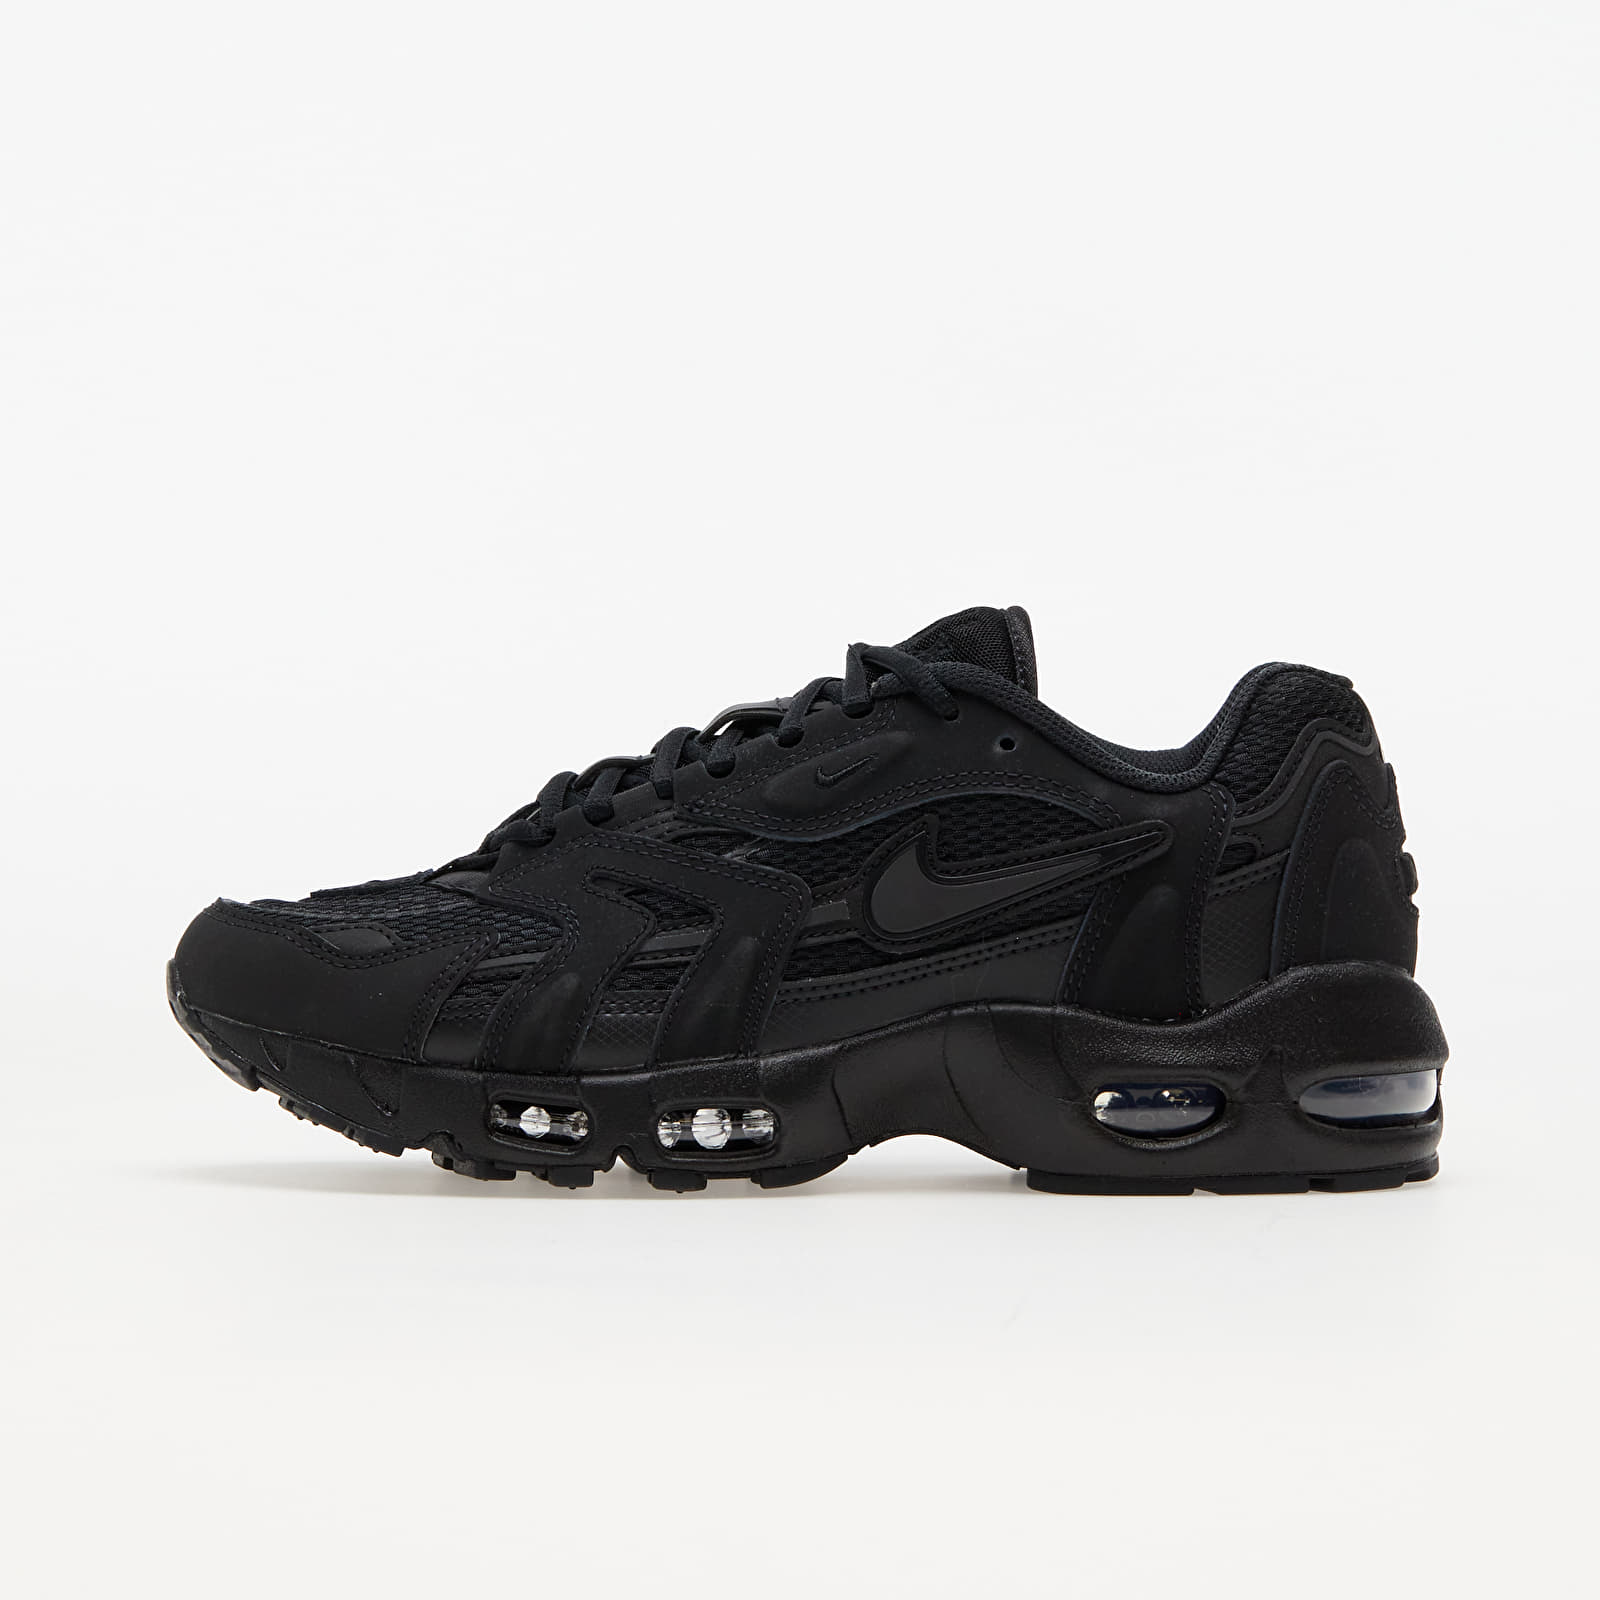 Nike Air Max 96 2 Black/ Black-Black EUR 41